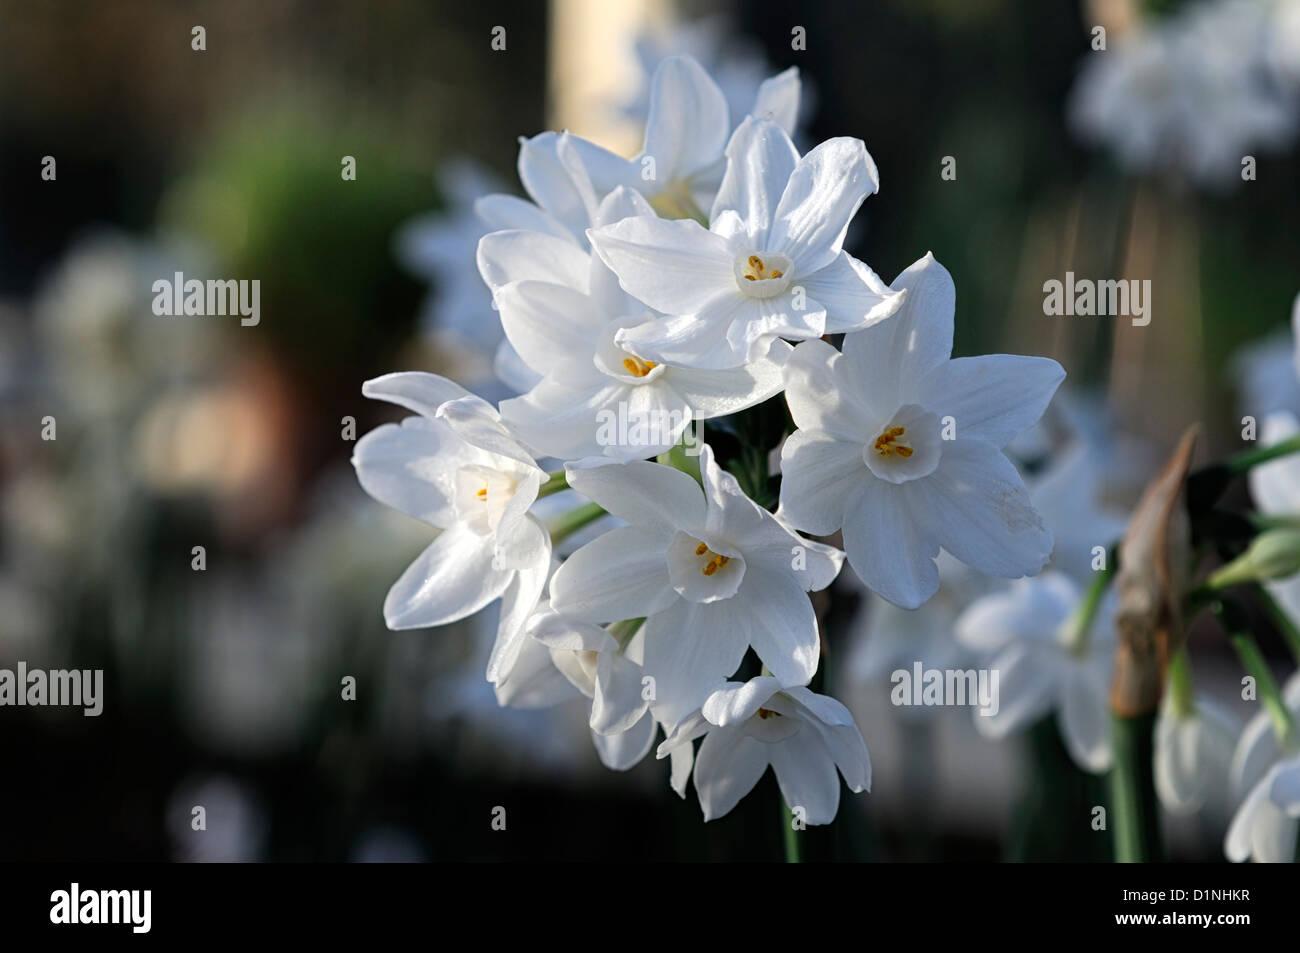 Narcissus Ziva Paperwhites Plants White Flowers Flowering Blooms